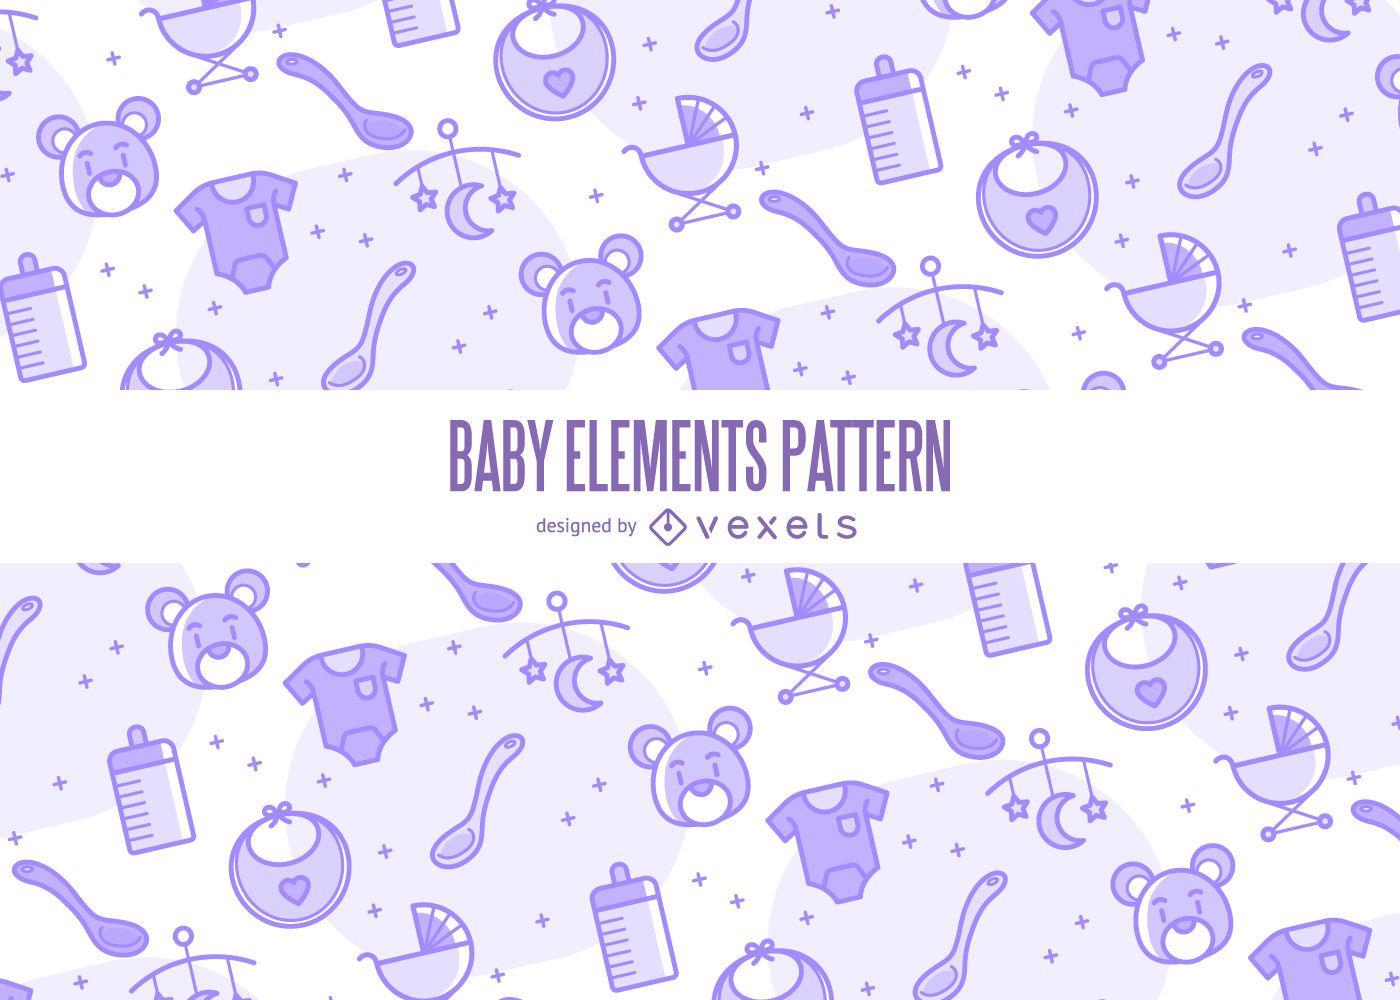 Baby elements pattern